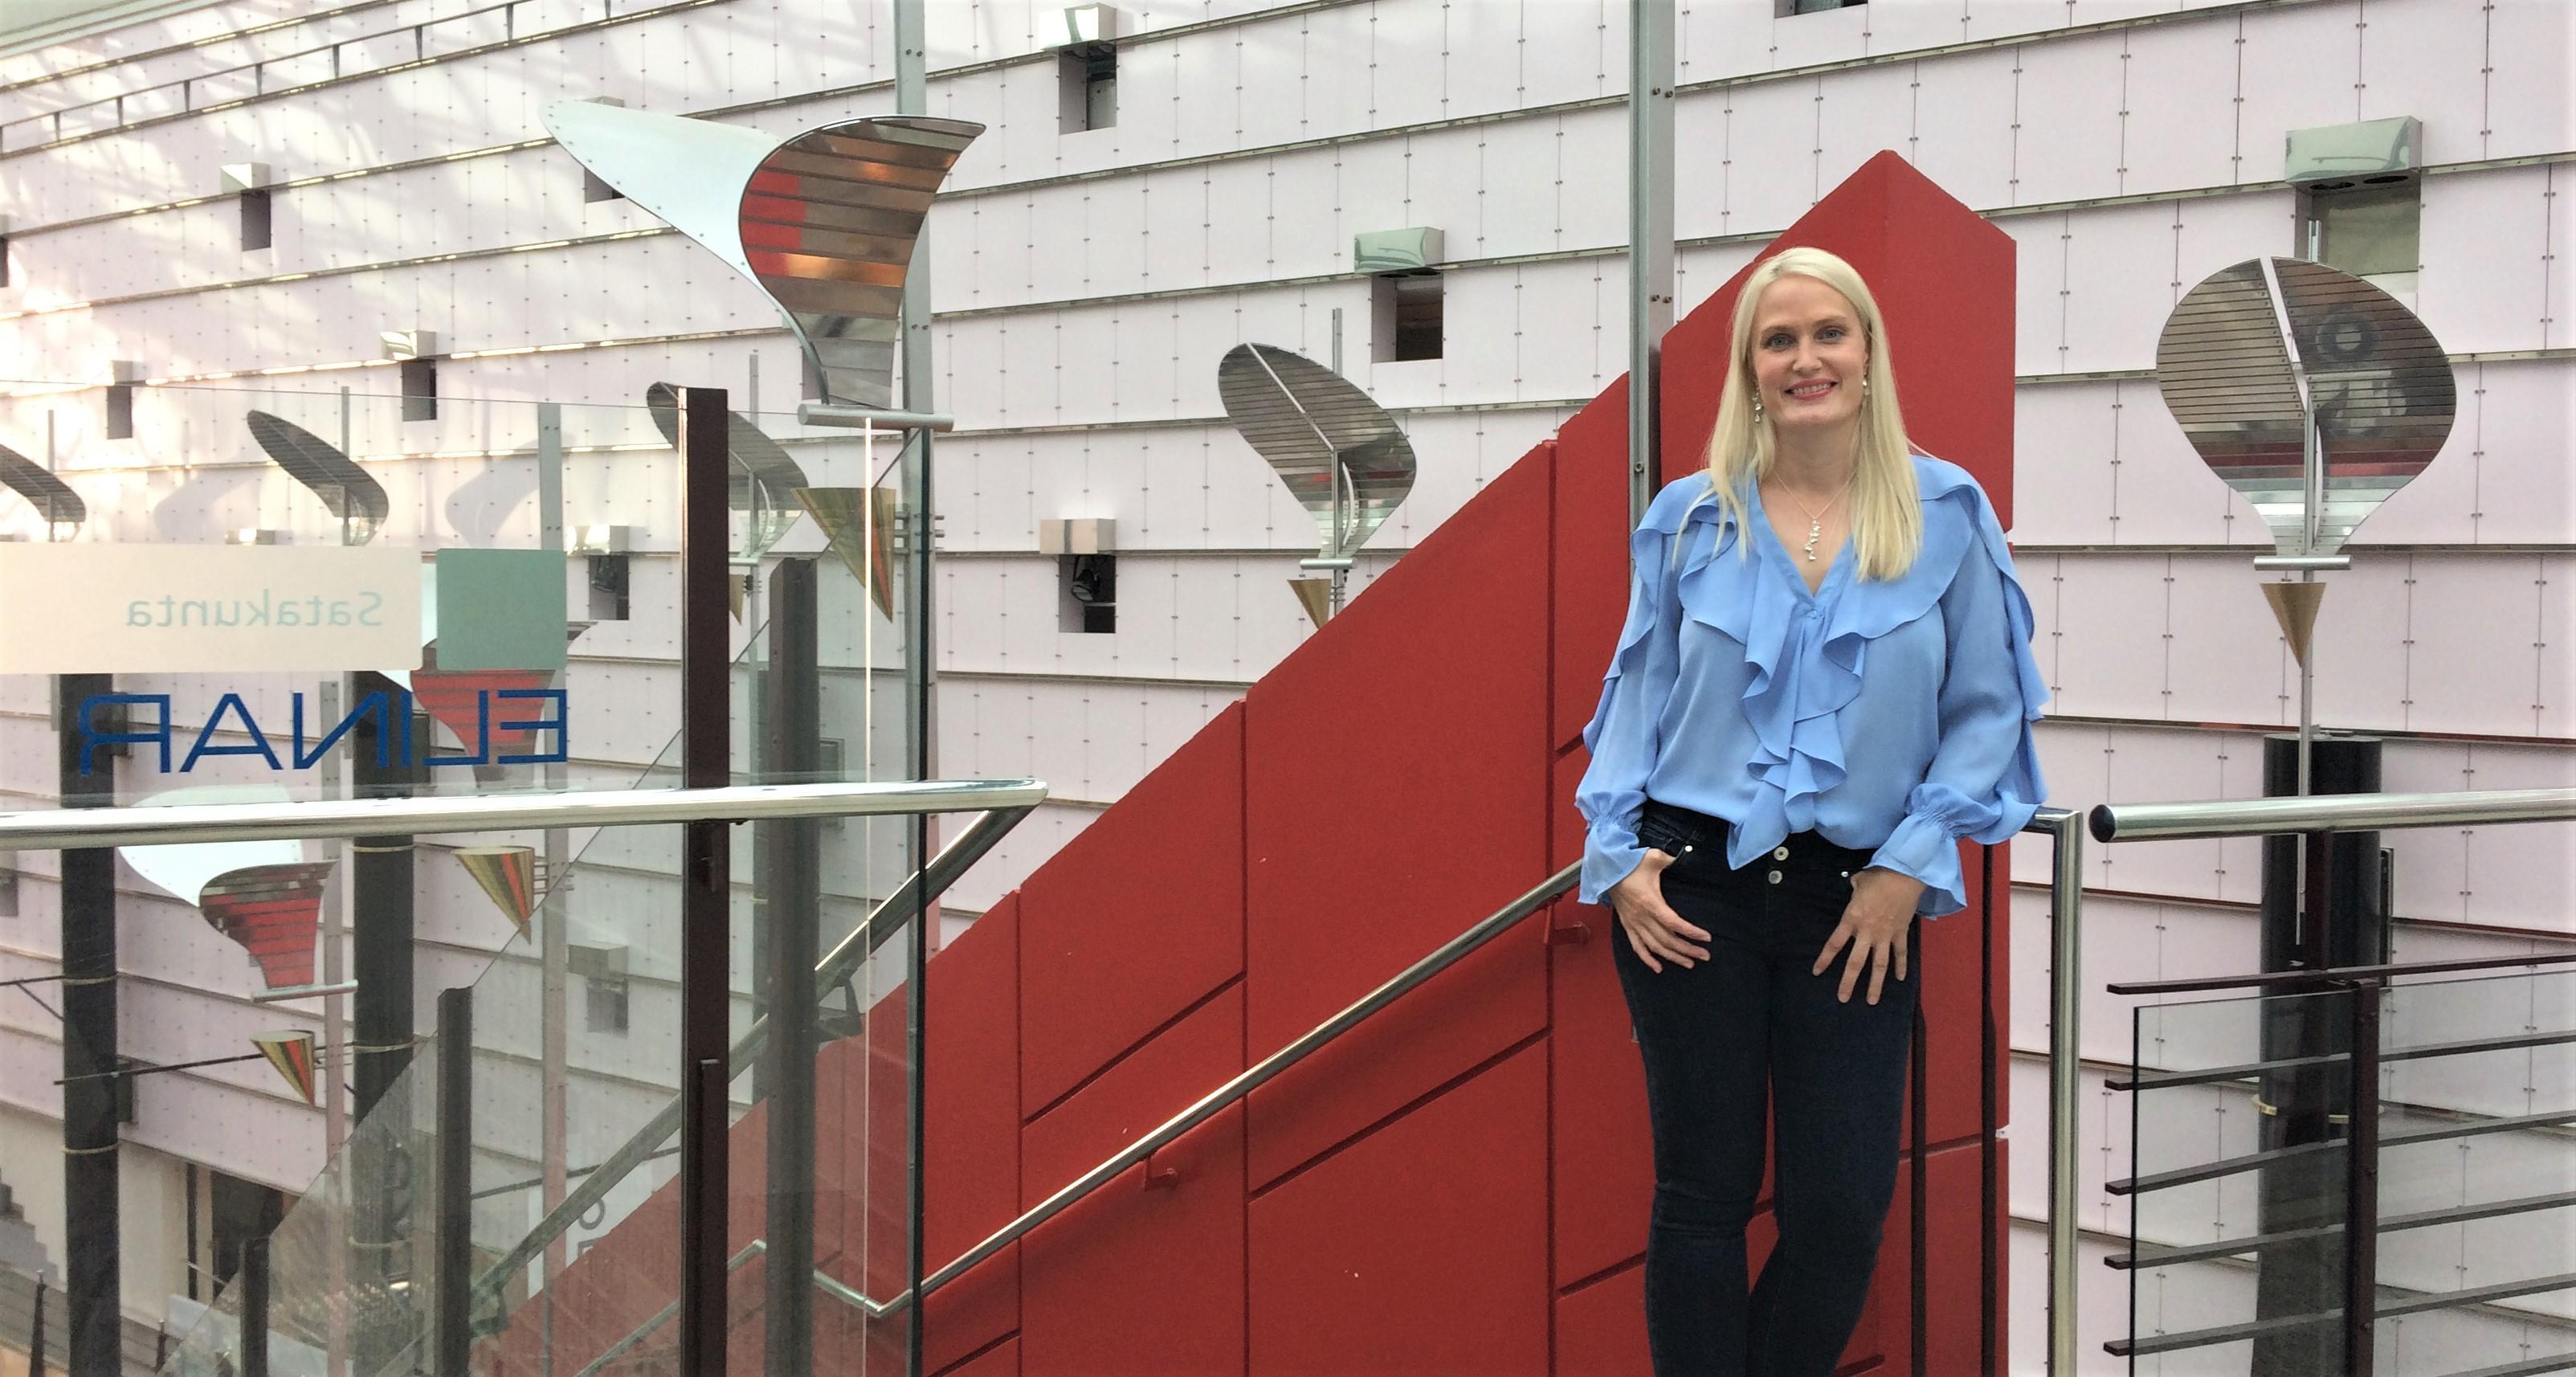 Marketing Manager of Elinar, Leena Tähti standing in BEPOP